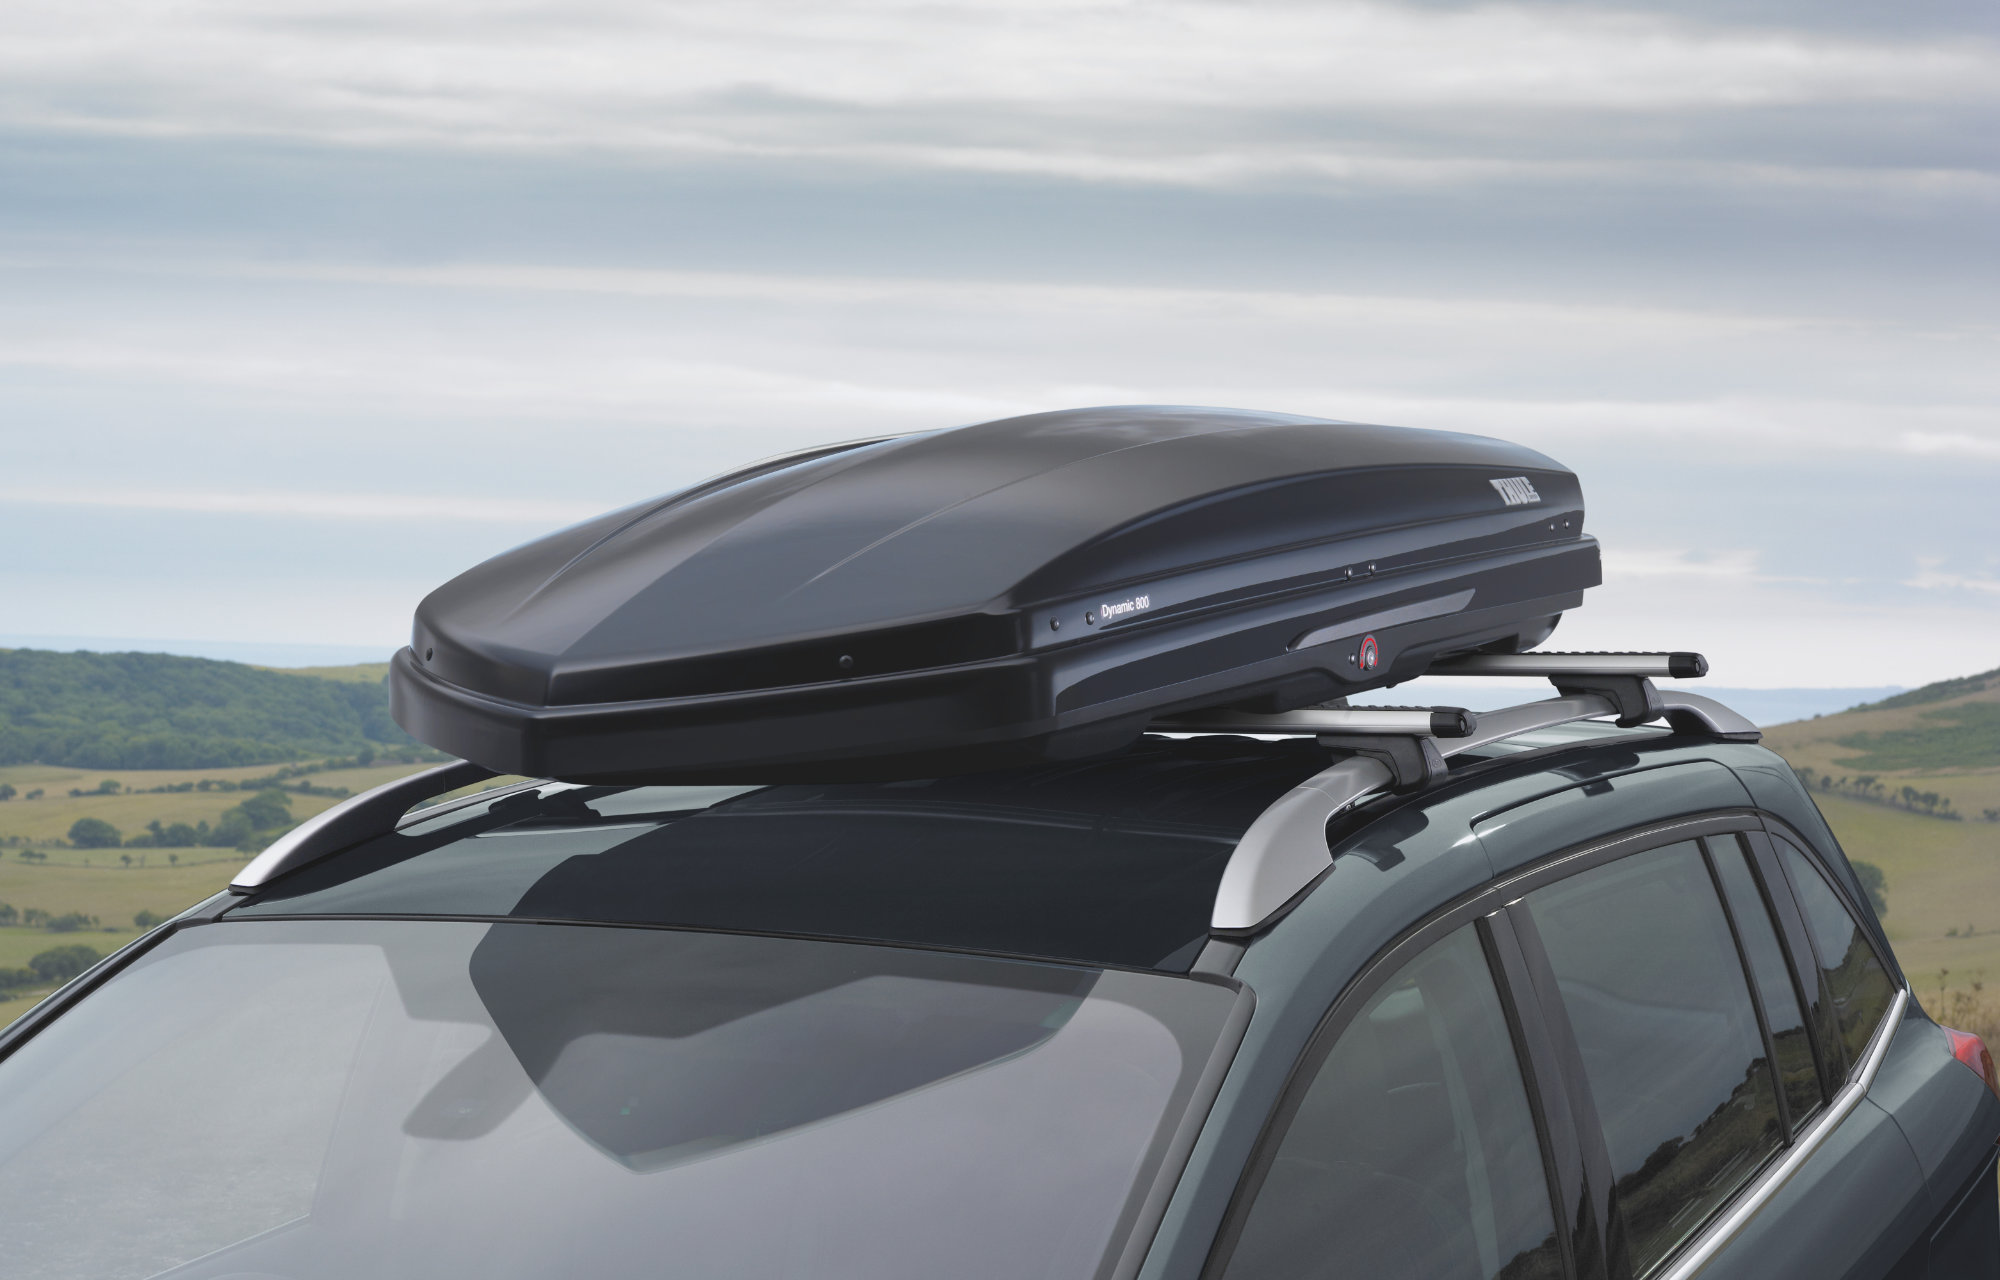 Dachboxen der Auto Kappeler AG